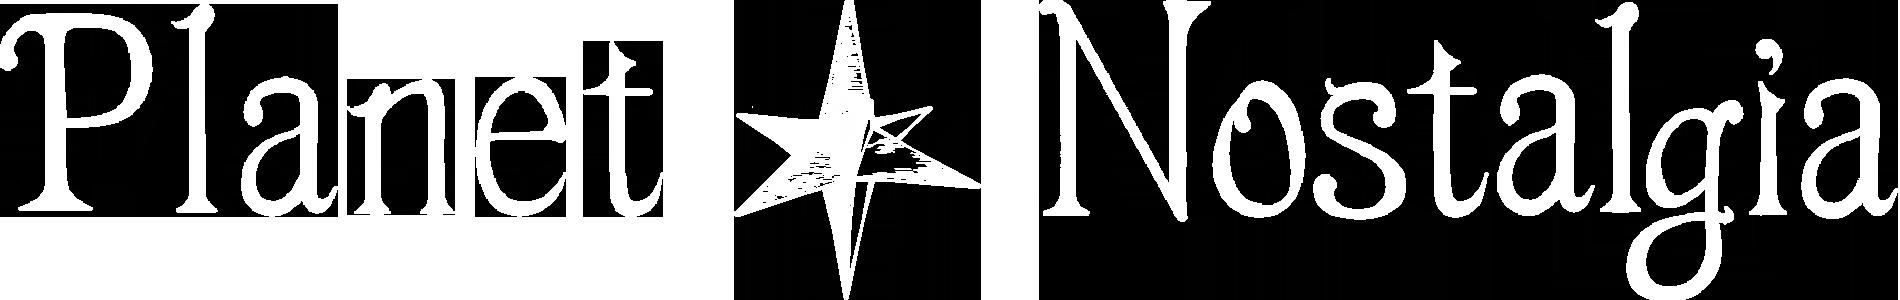 Planet Nostalgia ノスタルジックなアクセサリー